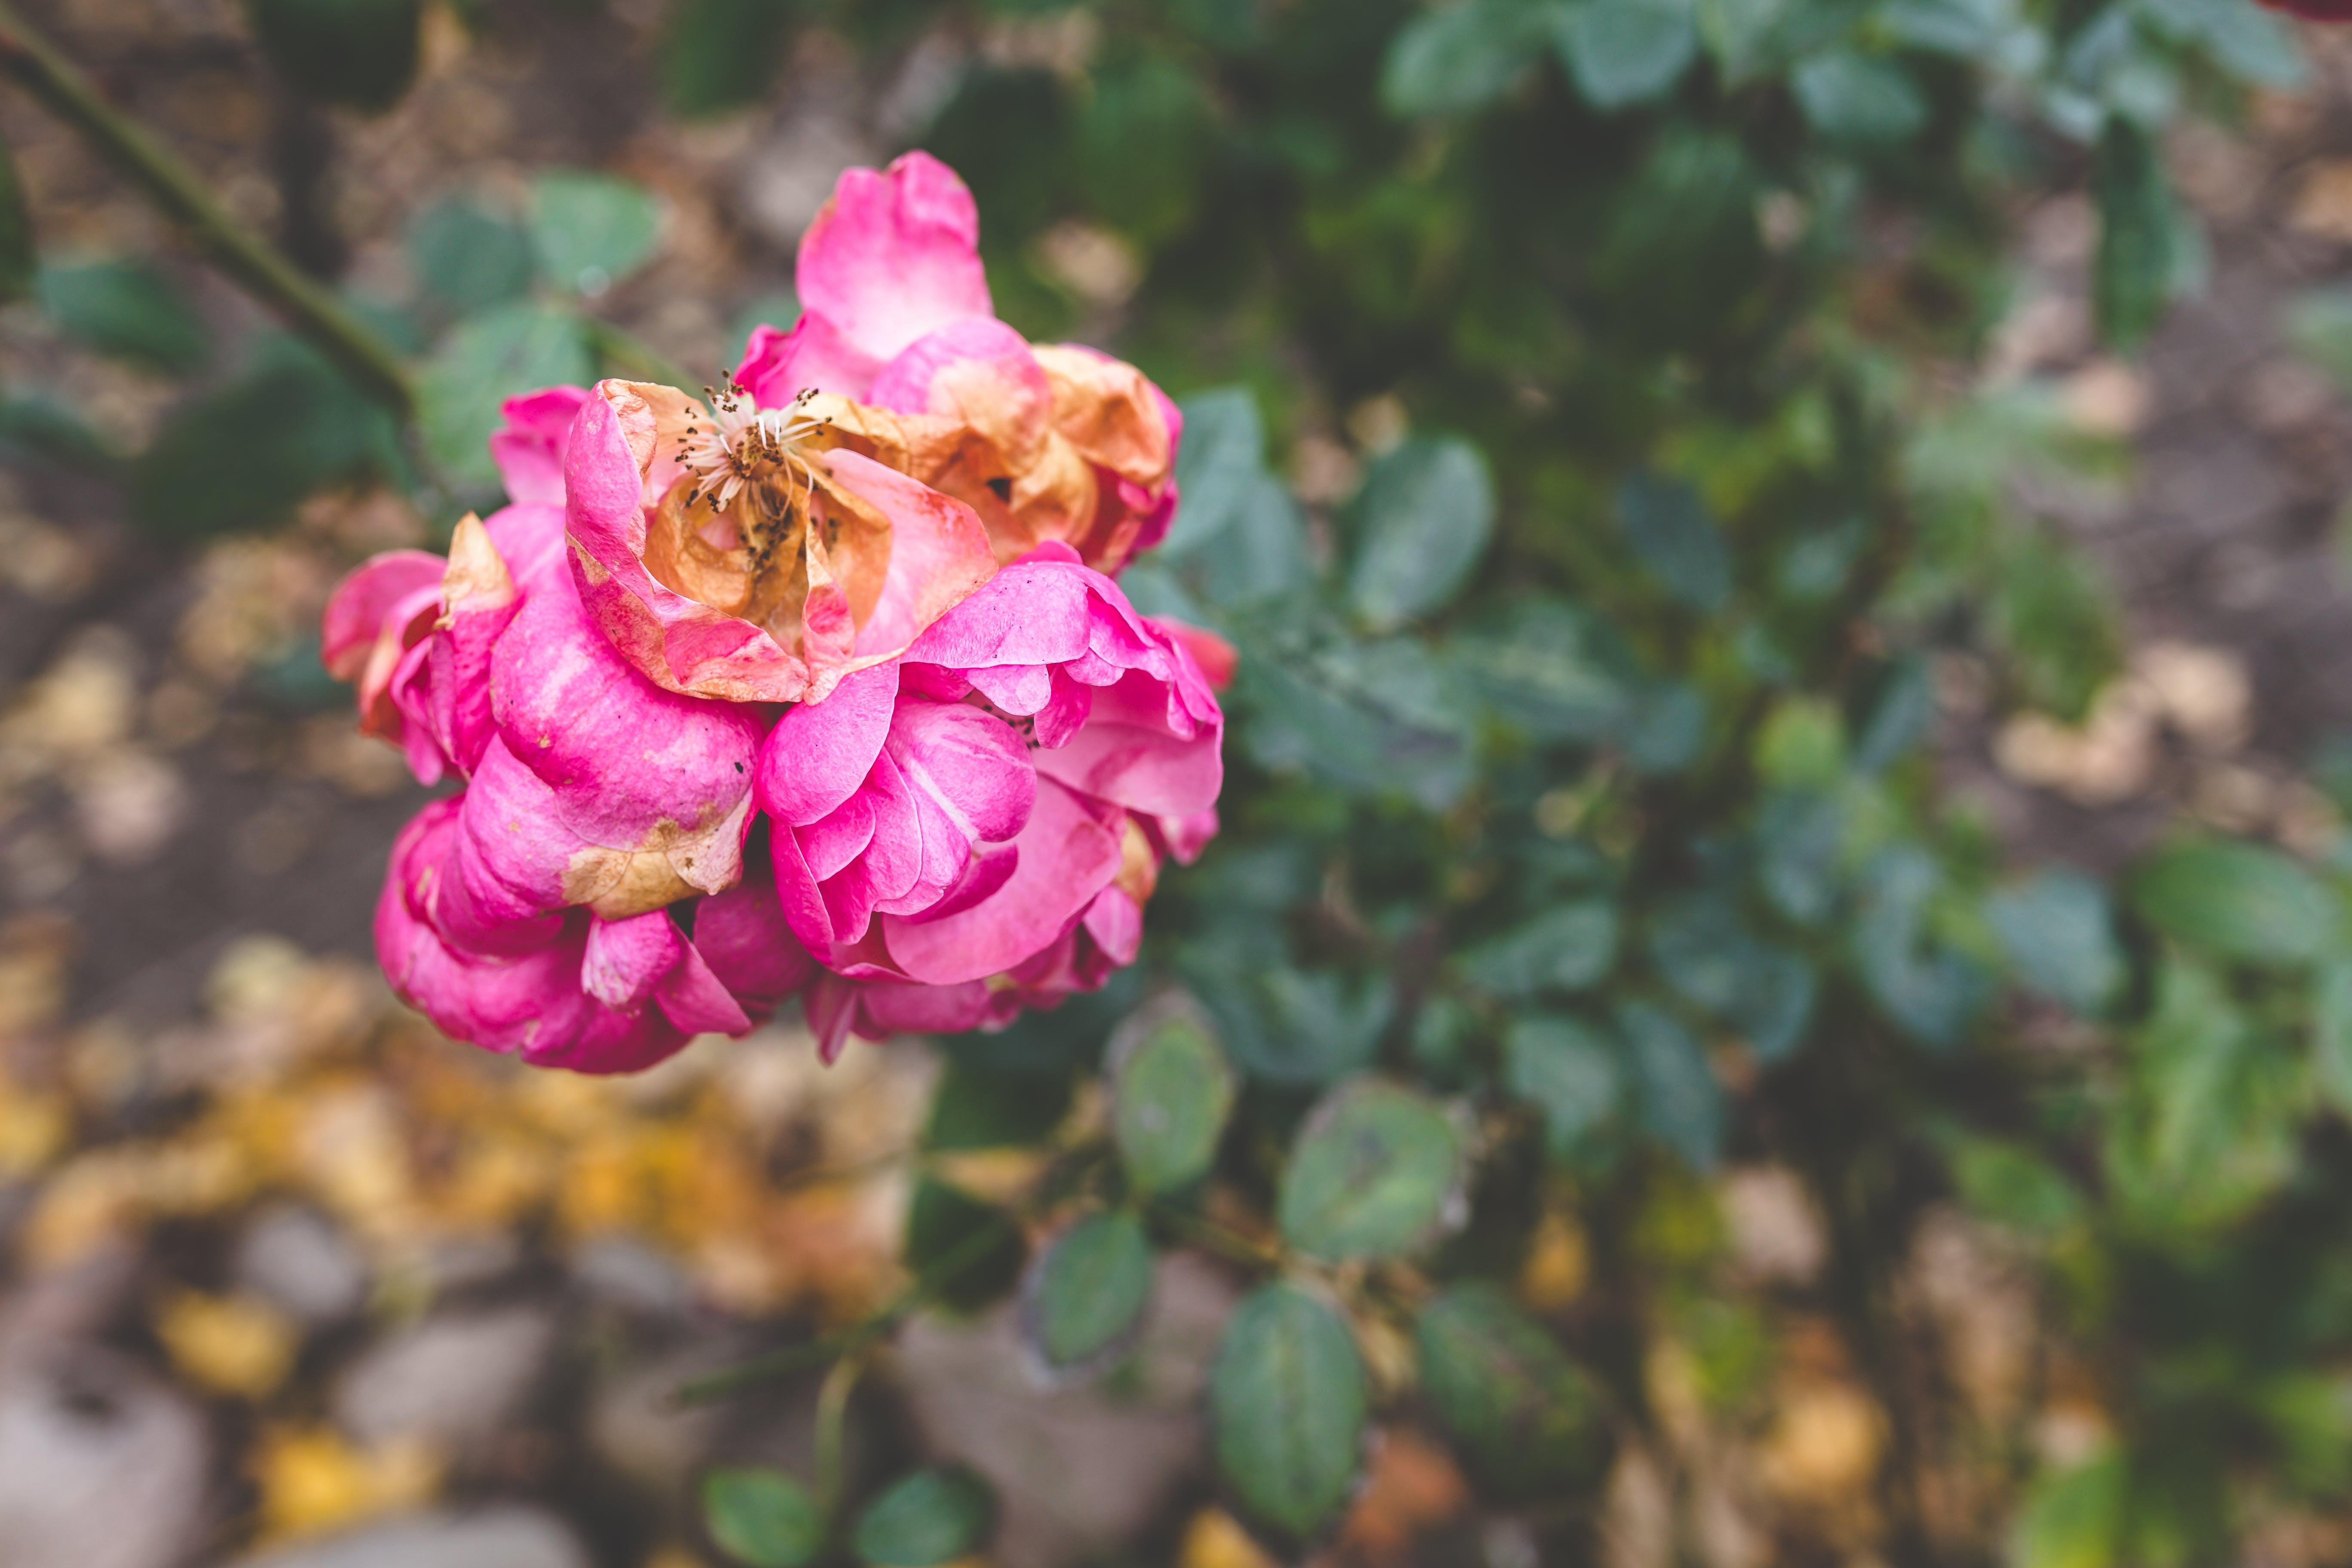 Gratis arkivbilde med årstid, bleknet, blomst, død